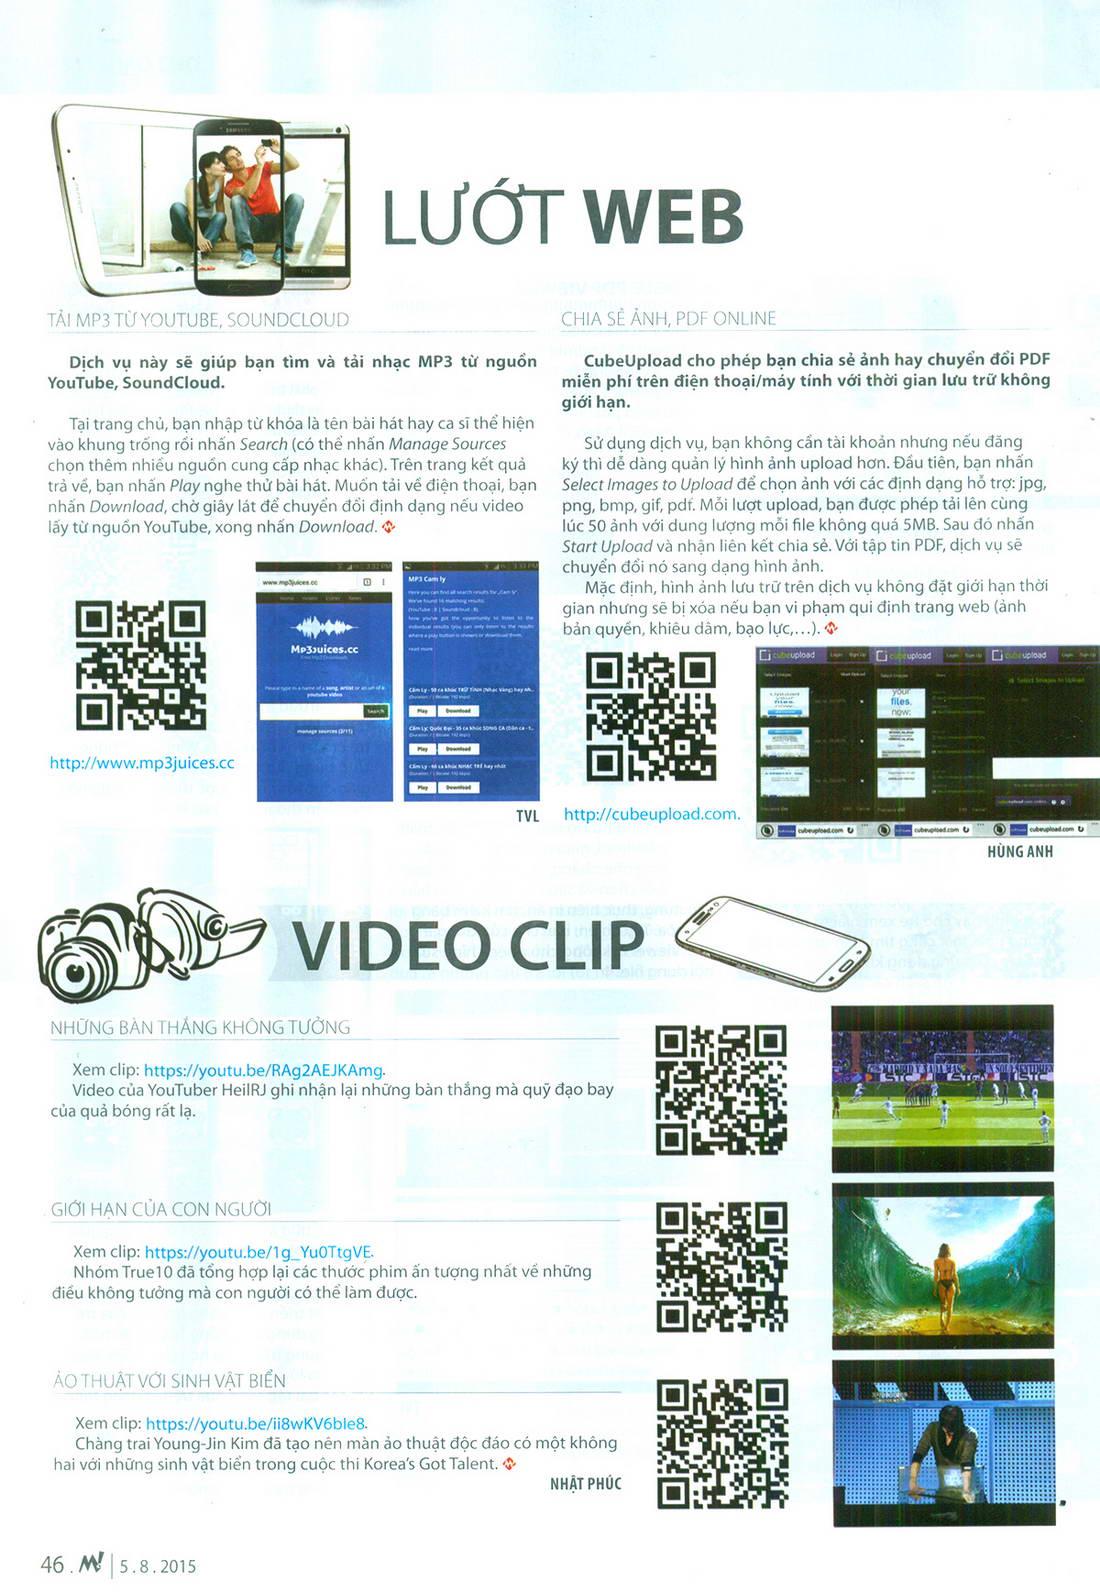 EChip Mobile – 511 - tapchicntt.com